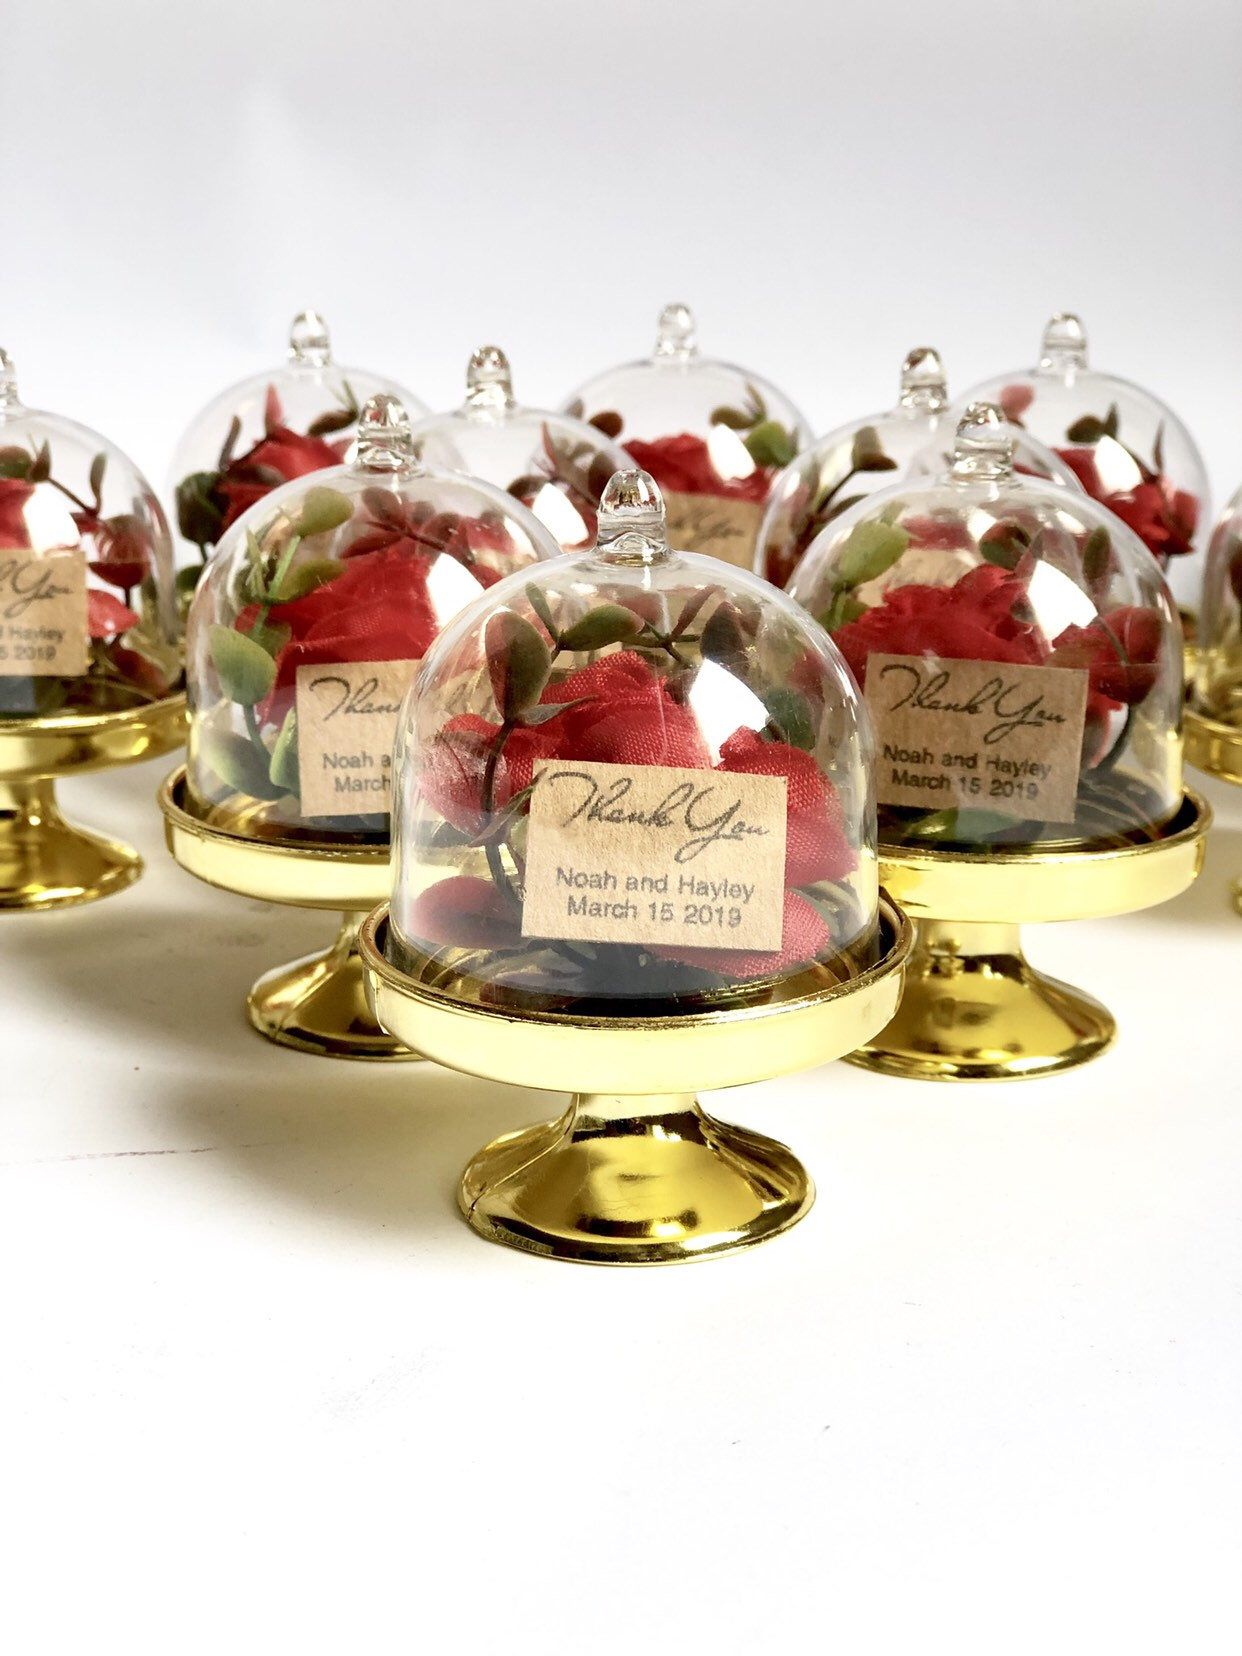 10pcs wedding favors for guests, wedding favors, favors